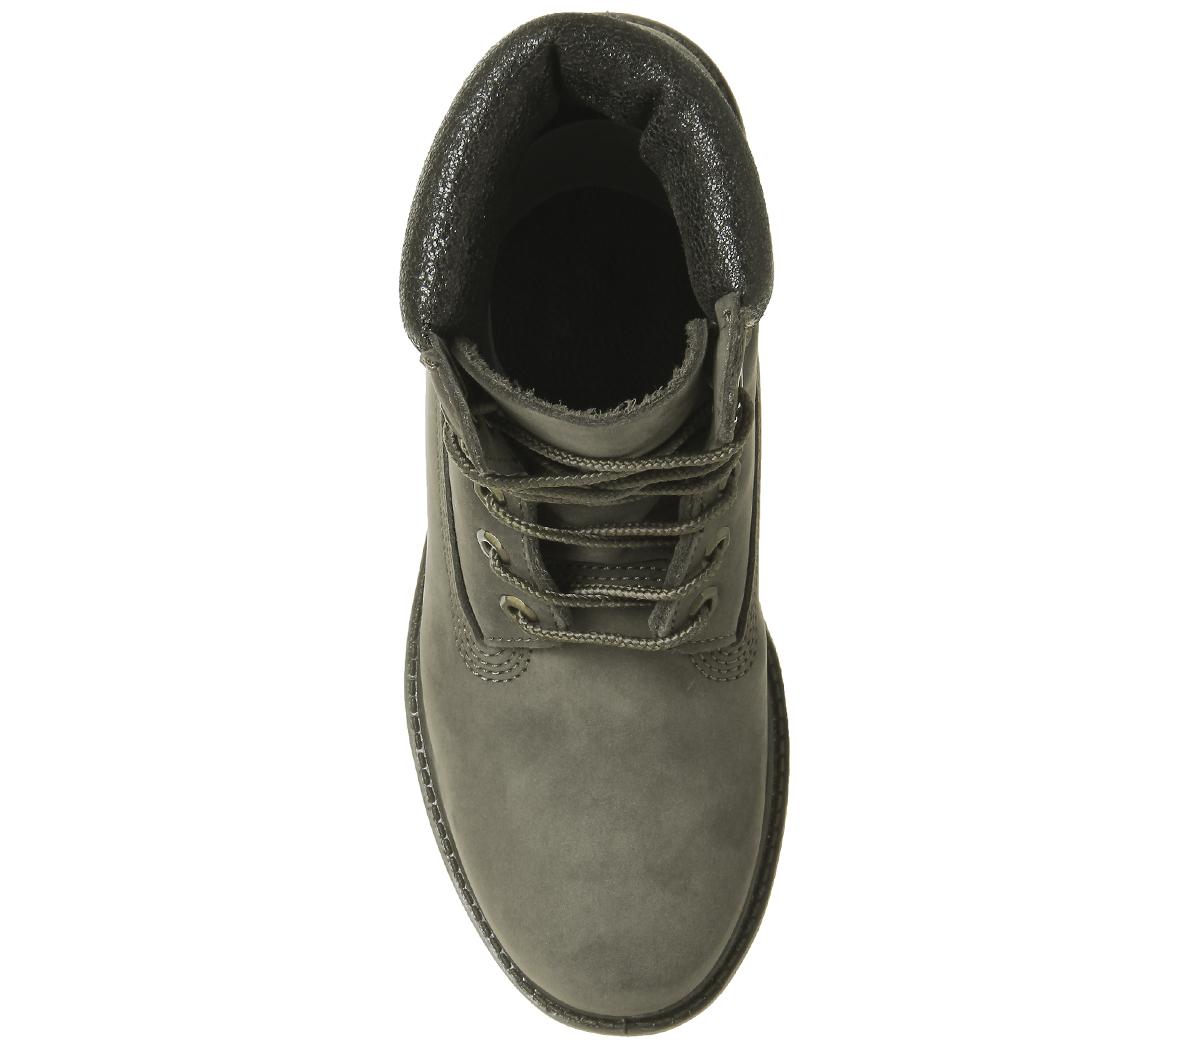 d3437b790049 Womens Timberland Premium 6 Boots Multi Canteen Nubuck Metallic ...